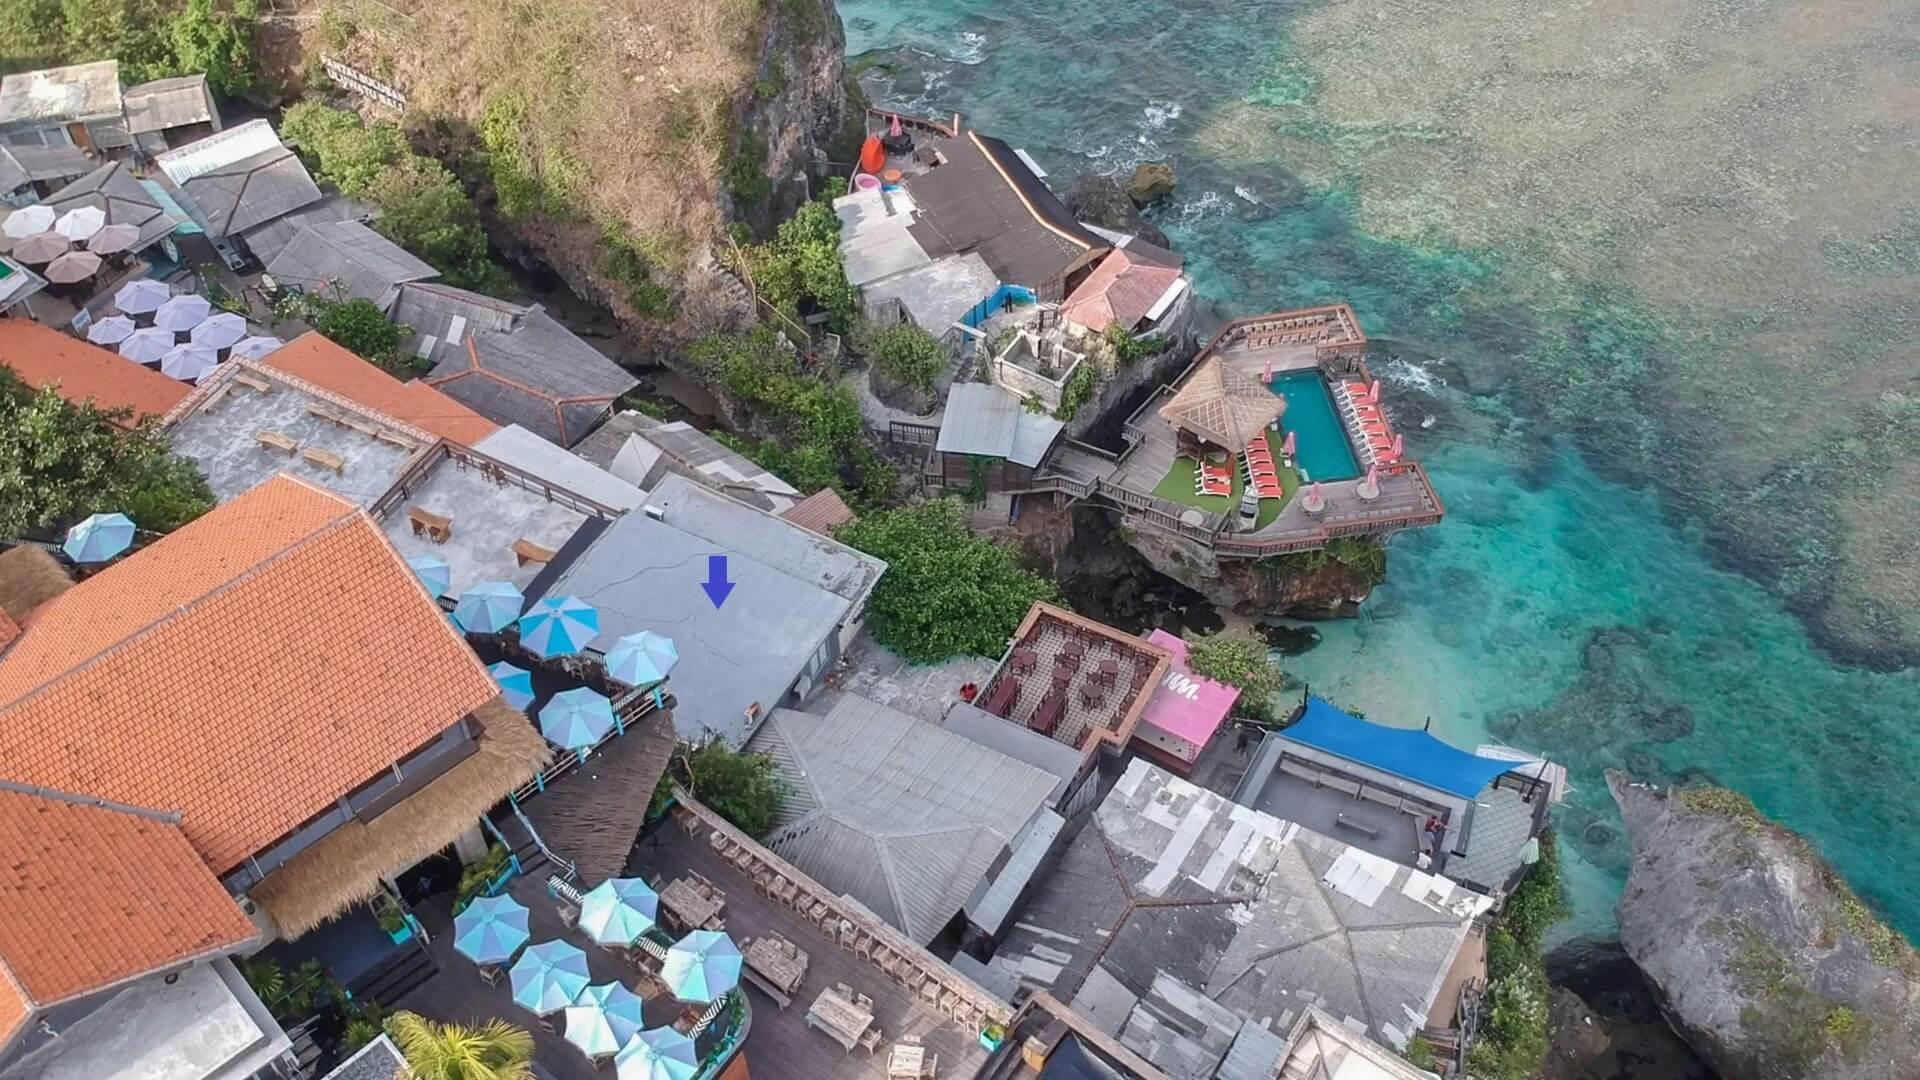 Uluwatu Cliff Apartment Blue Point Drone